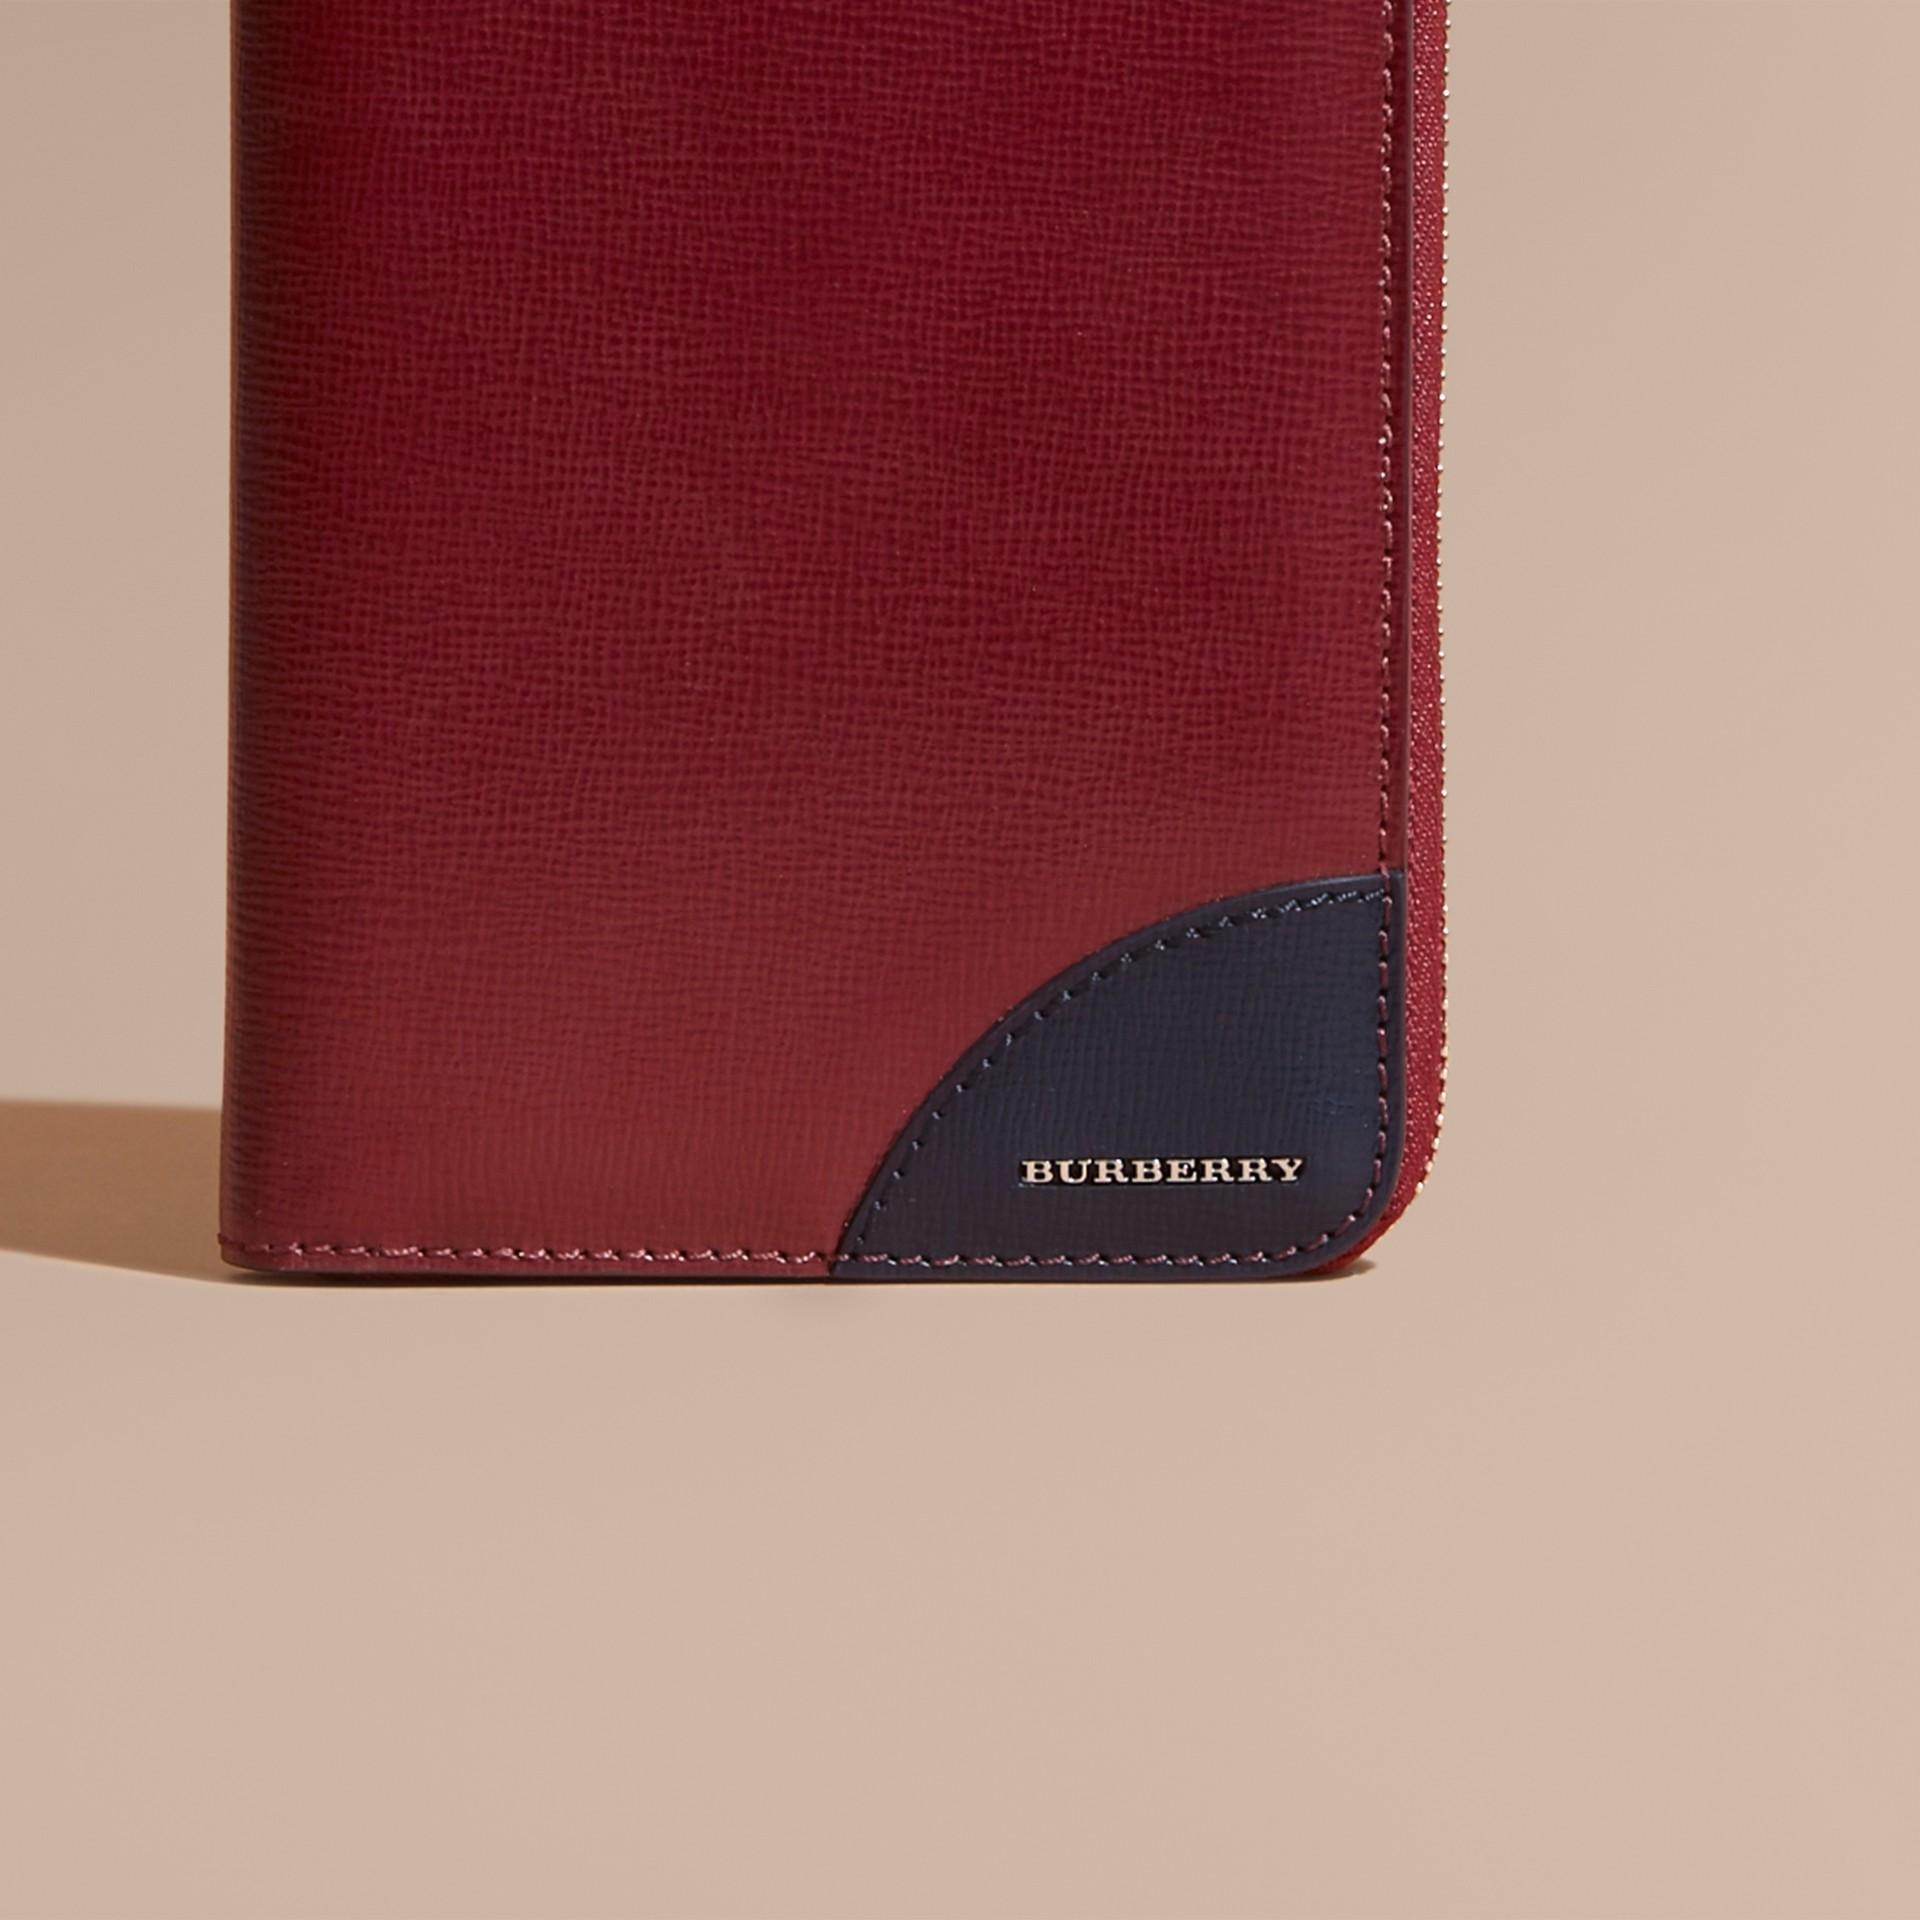 Contrast Corner London Leather Ziparound Wallet in Burgundy Red - gallery image 2